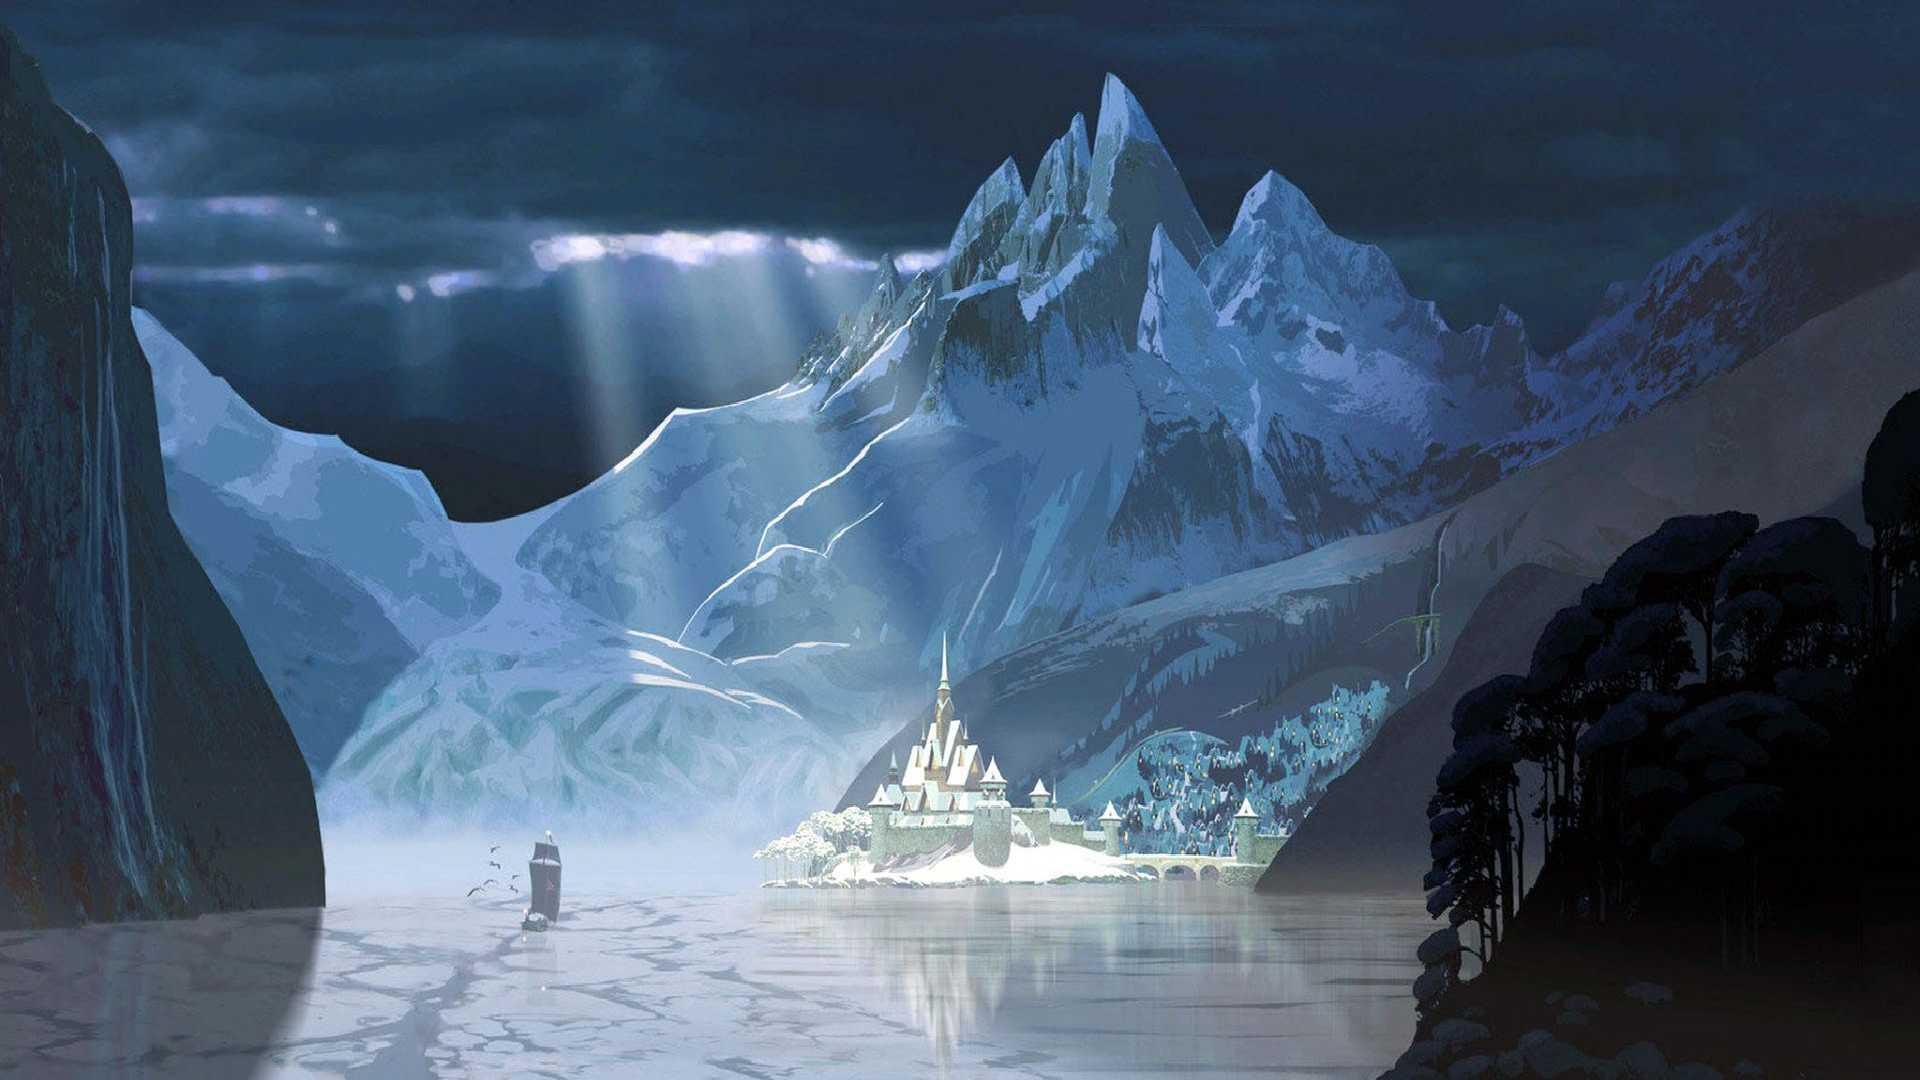 Frozen Wallpapers Frozen Disney Fondos Hd